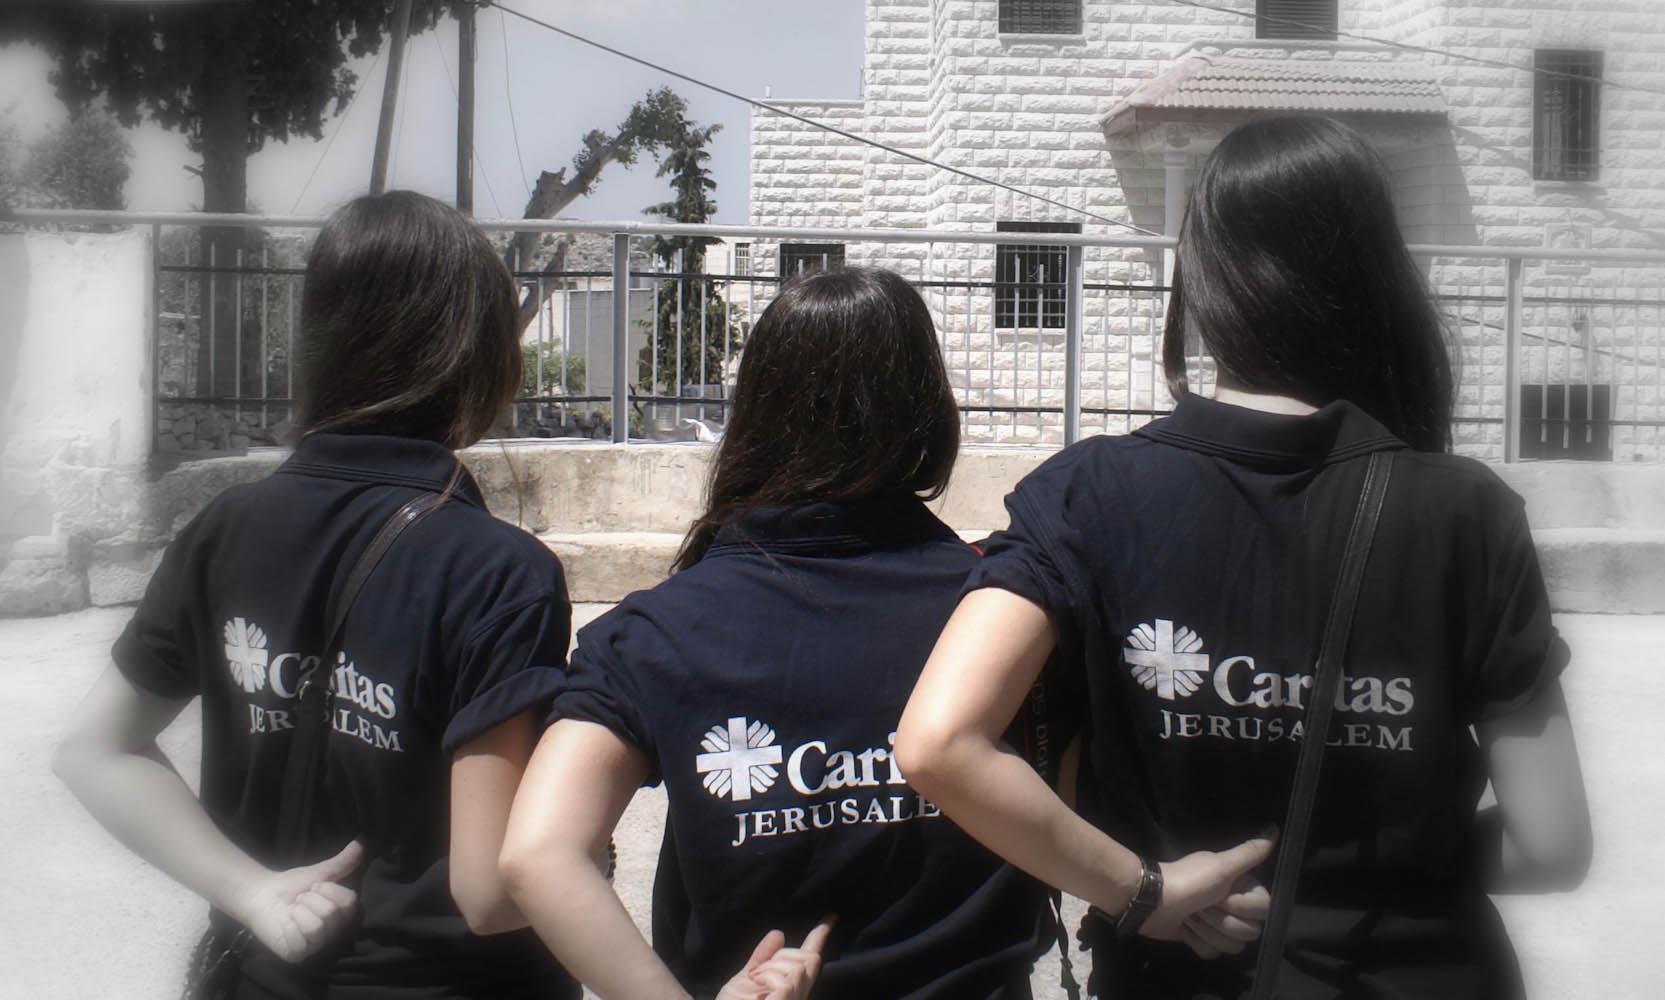 Caritas Jerusalem